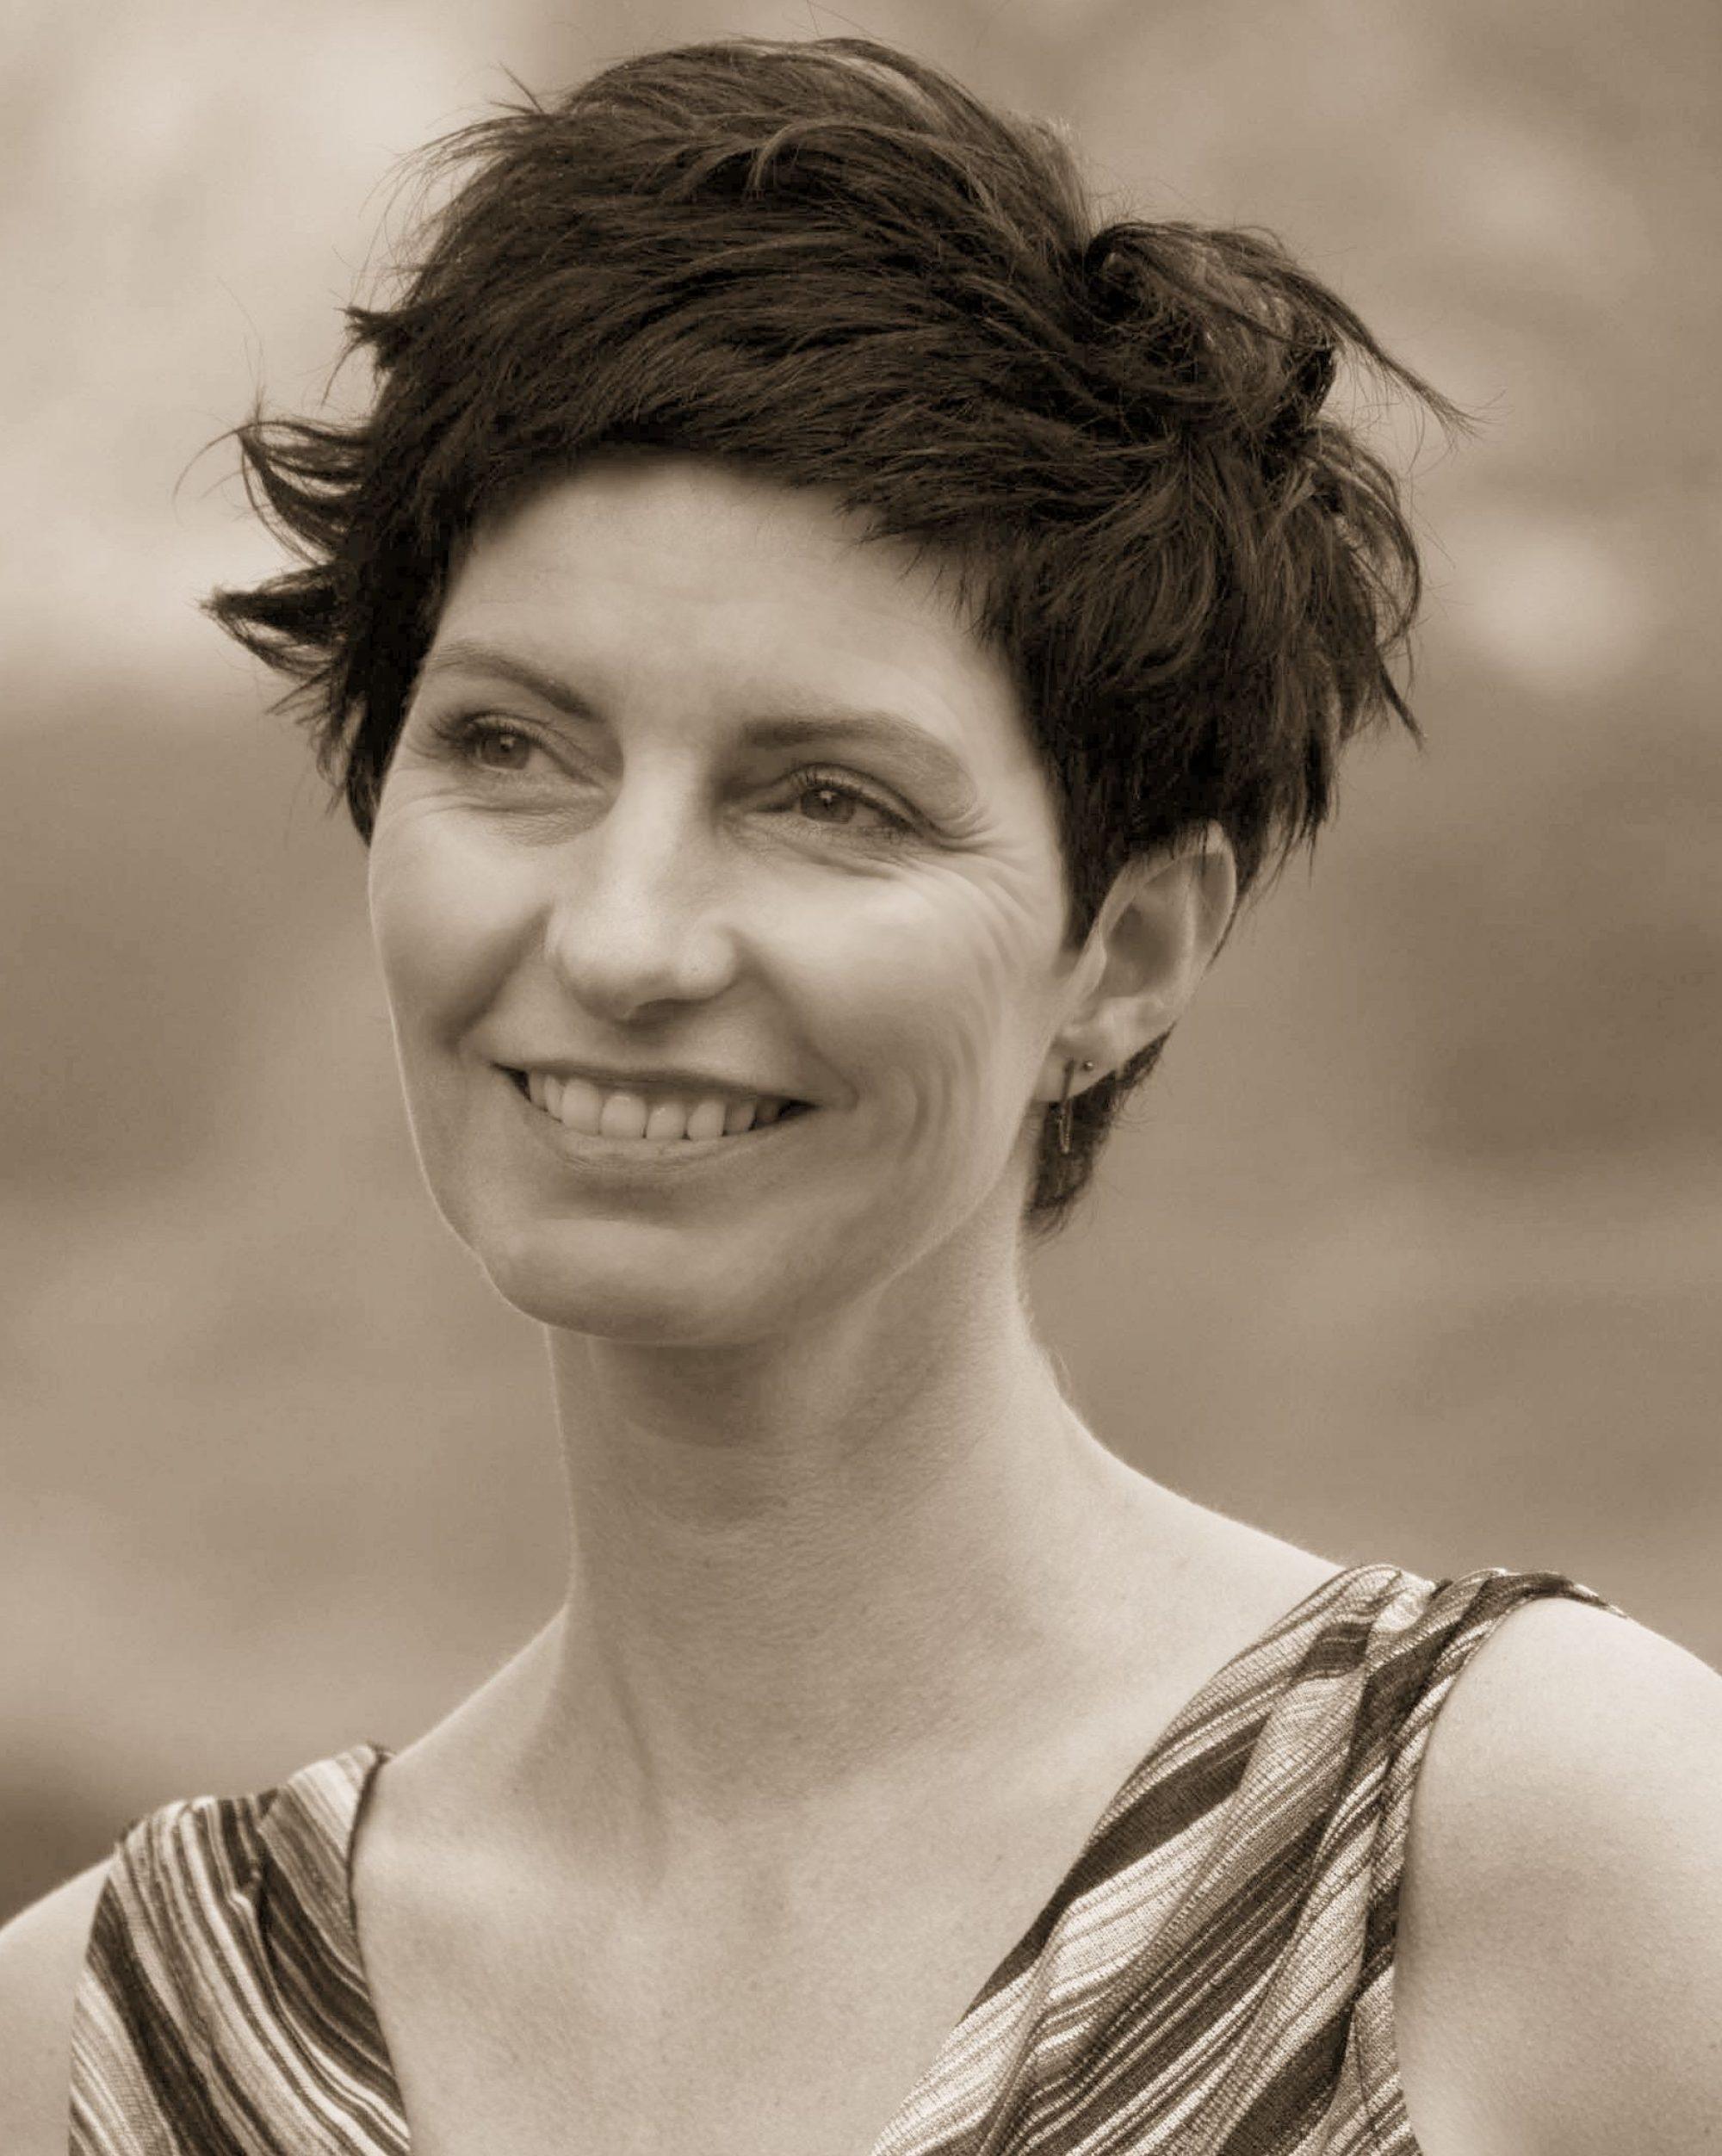 Alette Westerveld